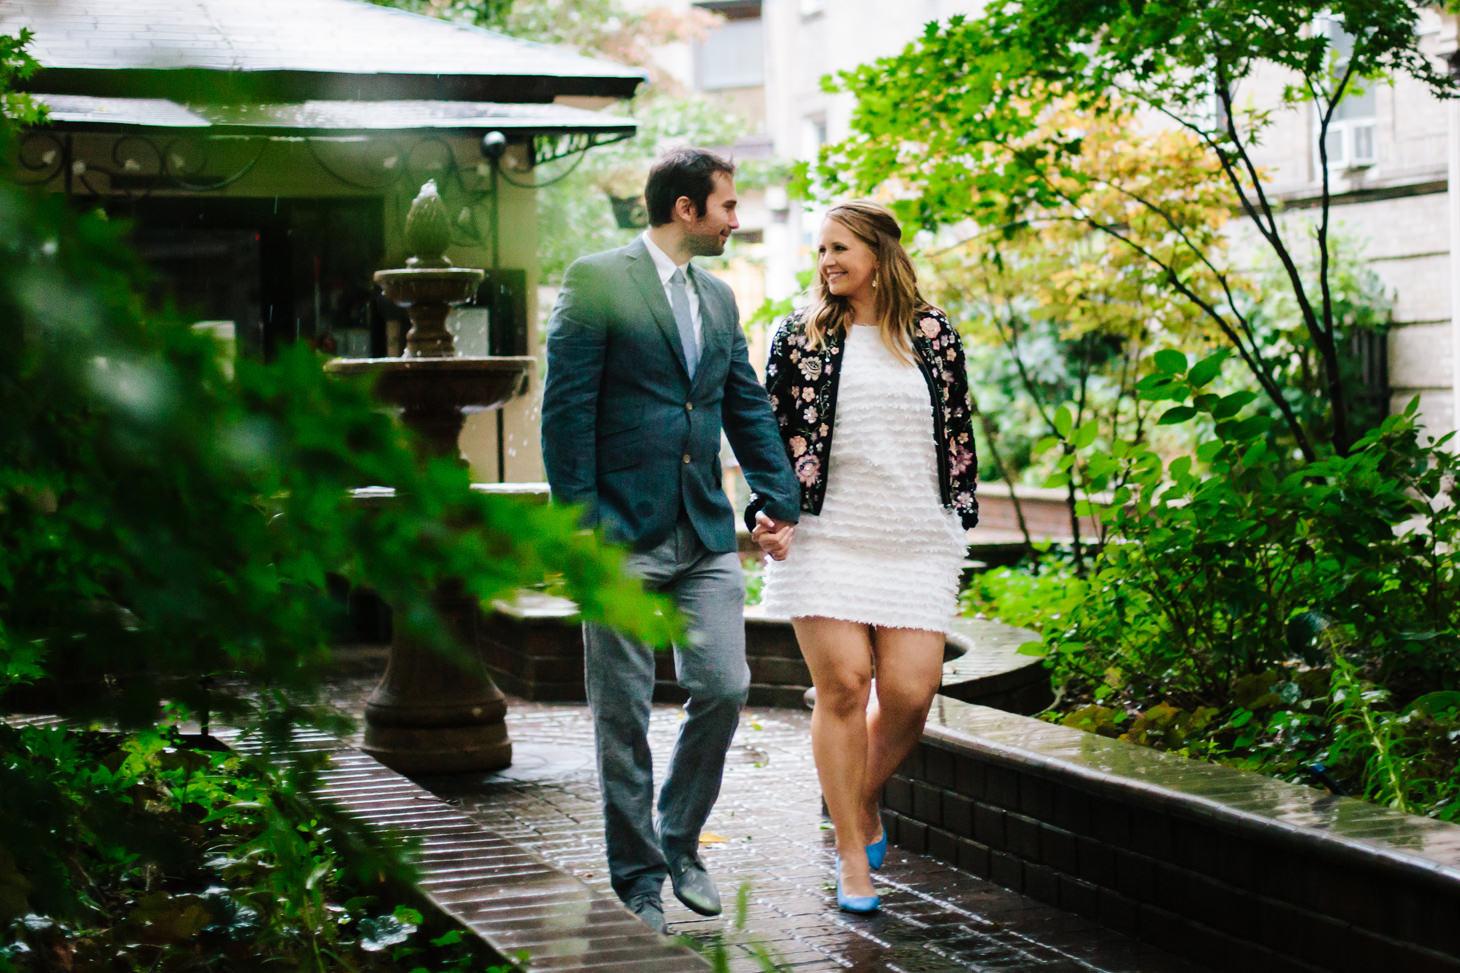 024-NYC-Intimate-Wedding-photography-SmittenChickens-city-hall-lauren-aaron.jpg